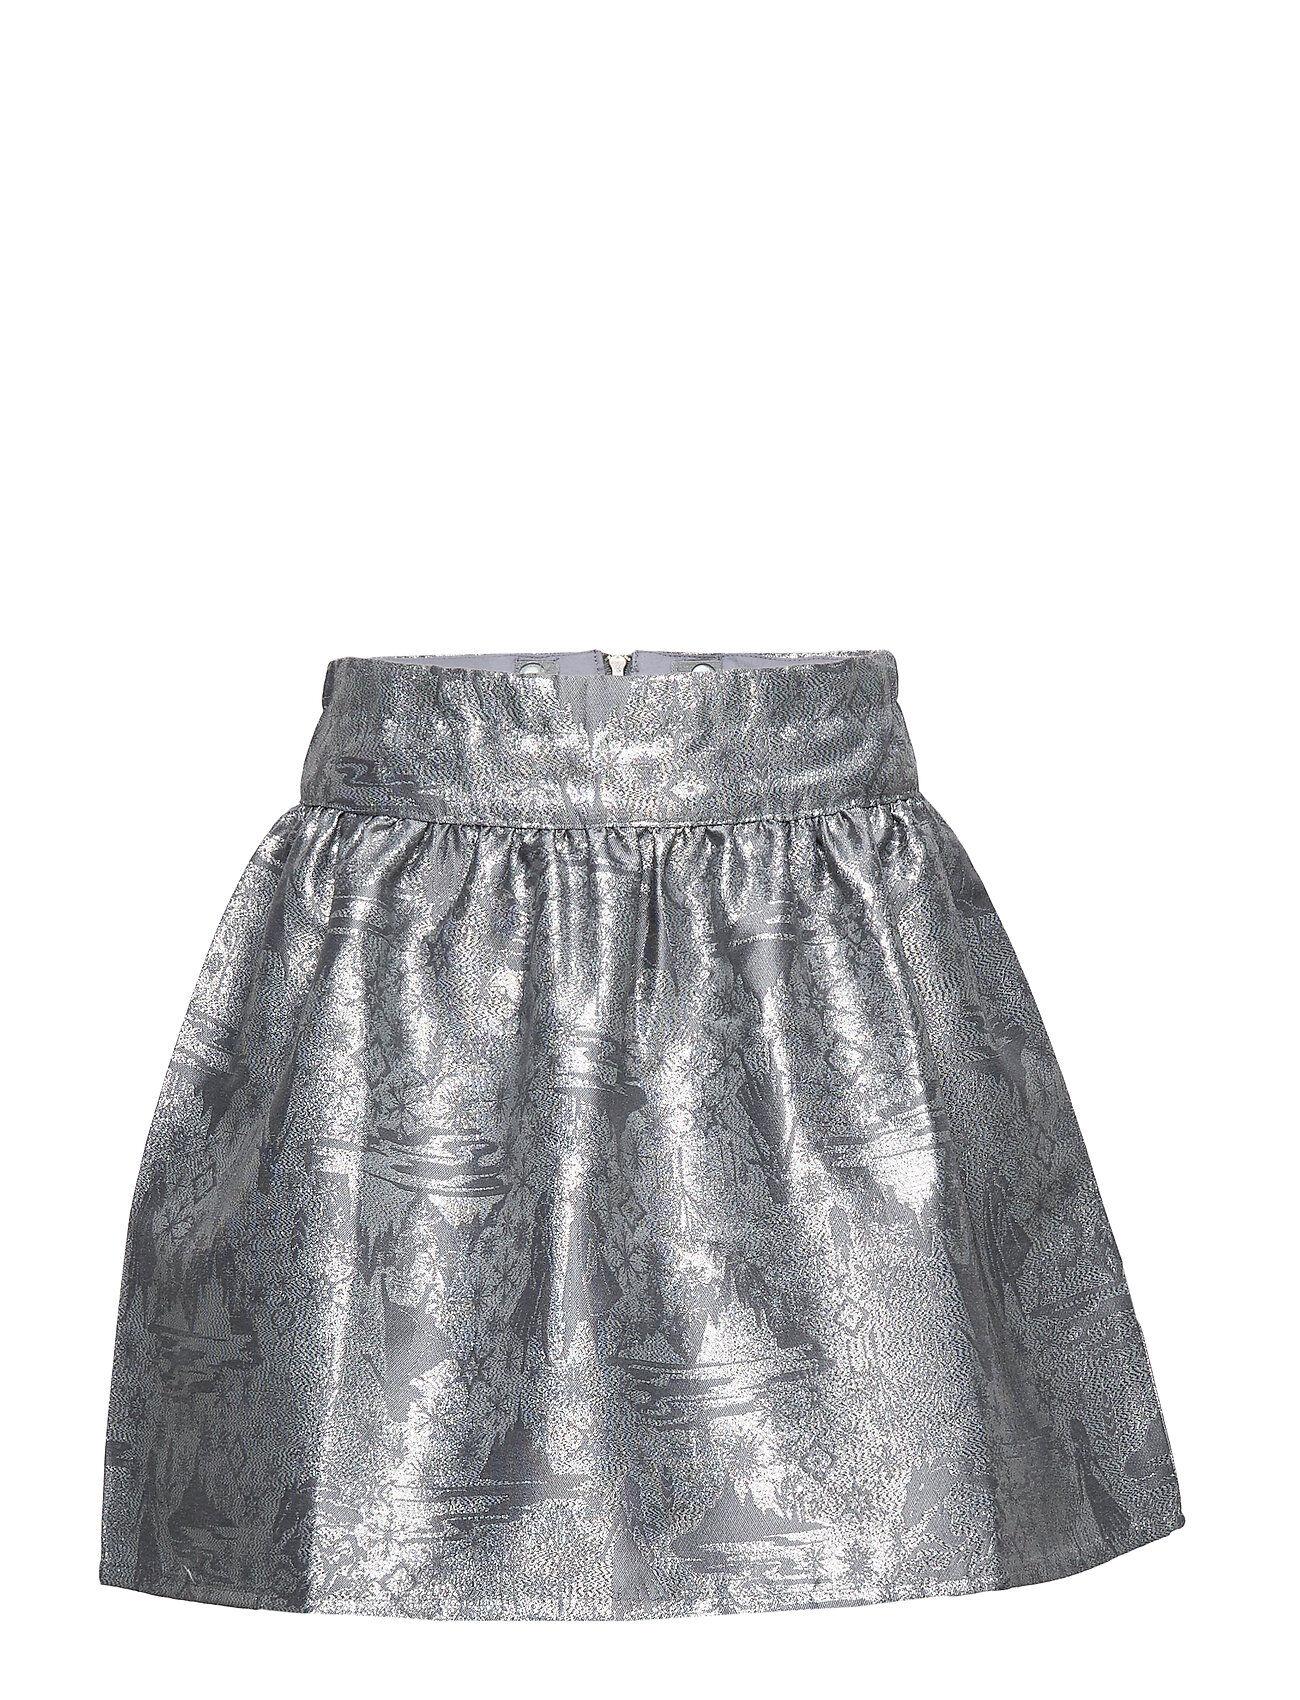 Disney Jacquard Skirt Frozen Hame Hopea Disney By Wheat